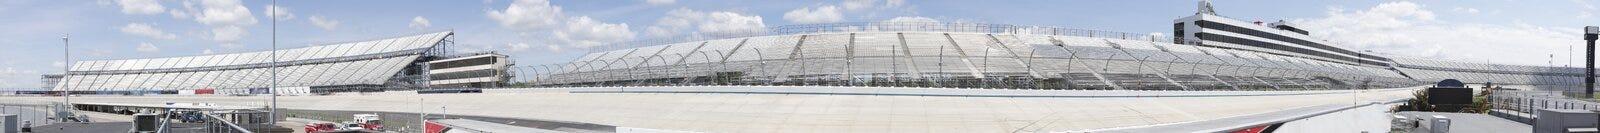 Panorama di Motor Speedway fotografie stock libere da diritti